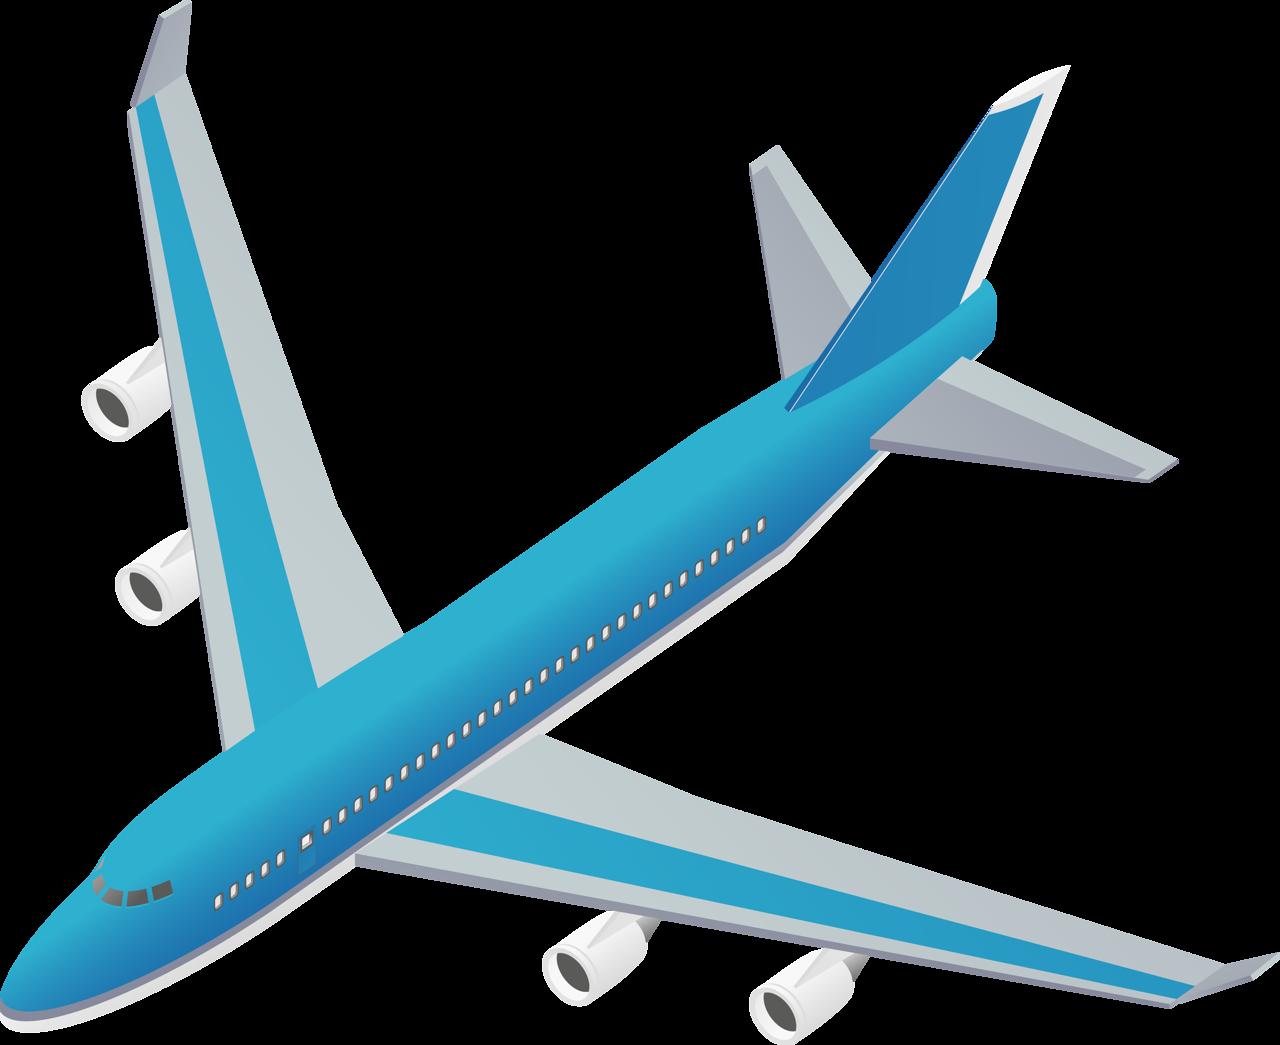 Views Album, Yandex, Airplane, Aviation, Plane, Air.